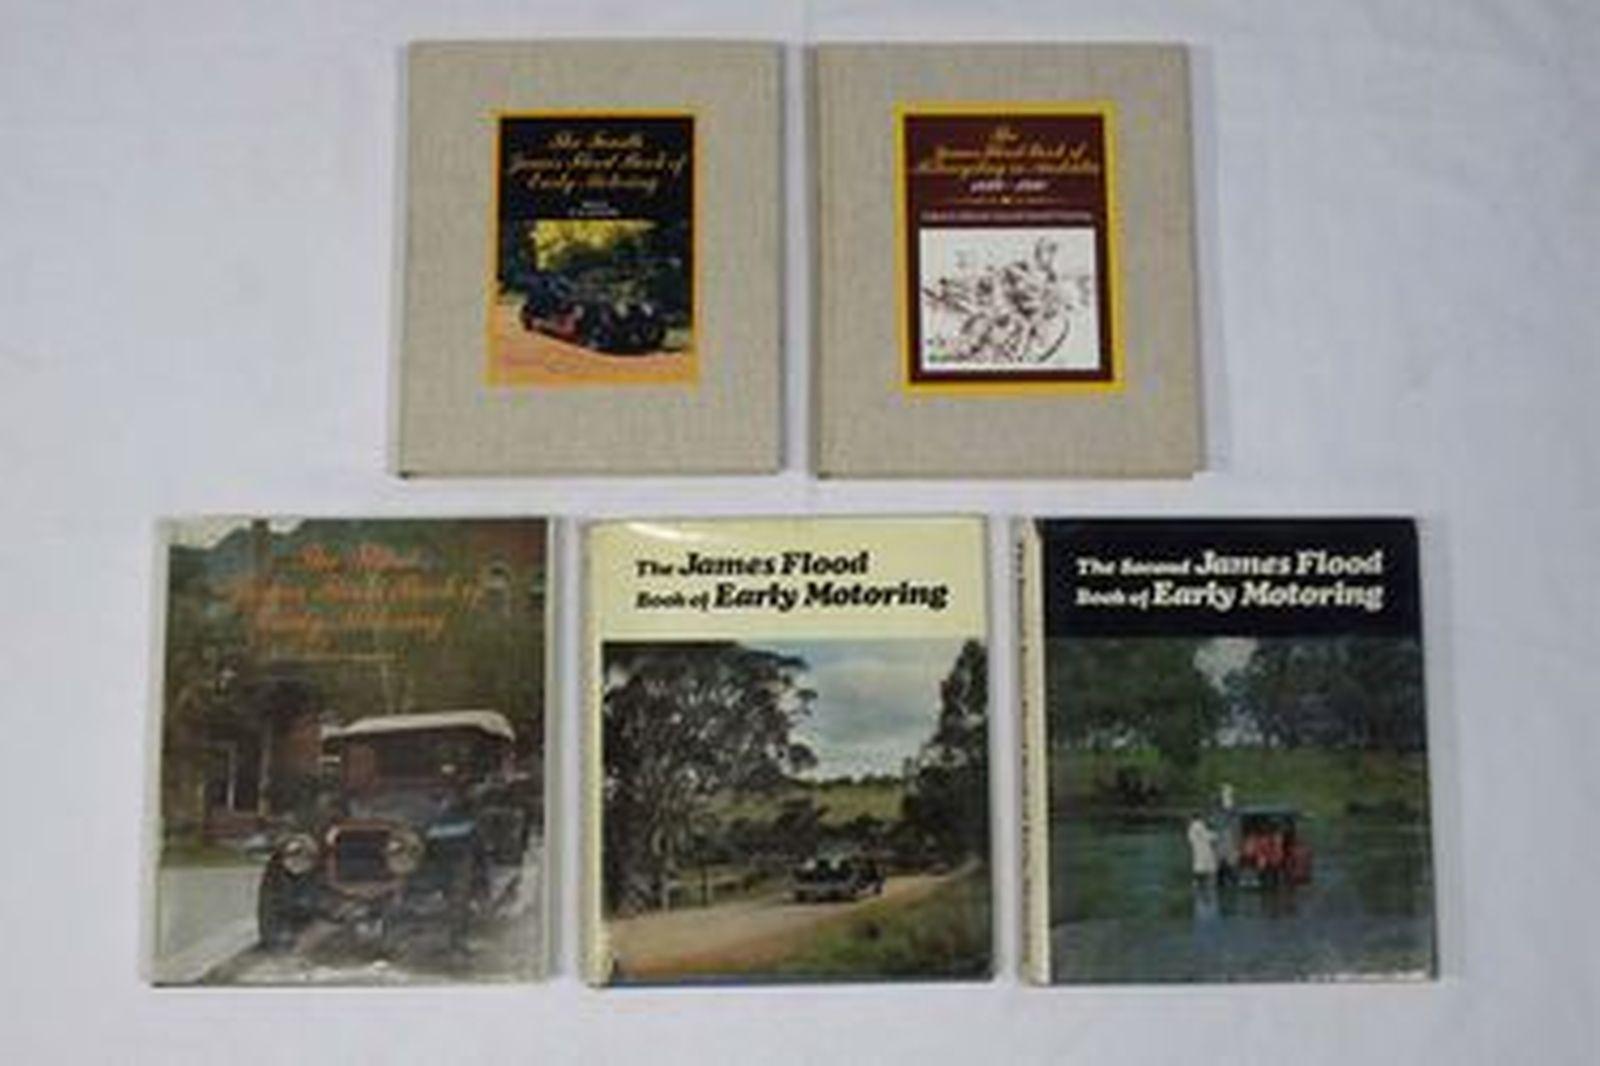 Motoring Books - Set of 5 James Flood Motoring Books